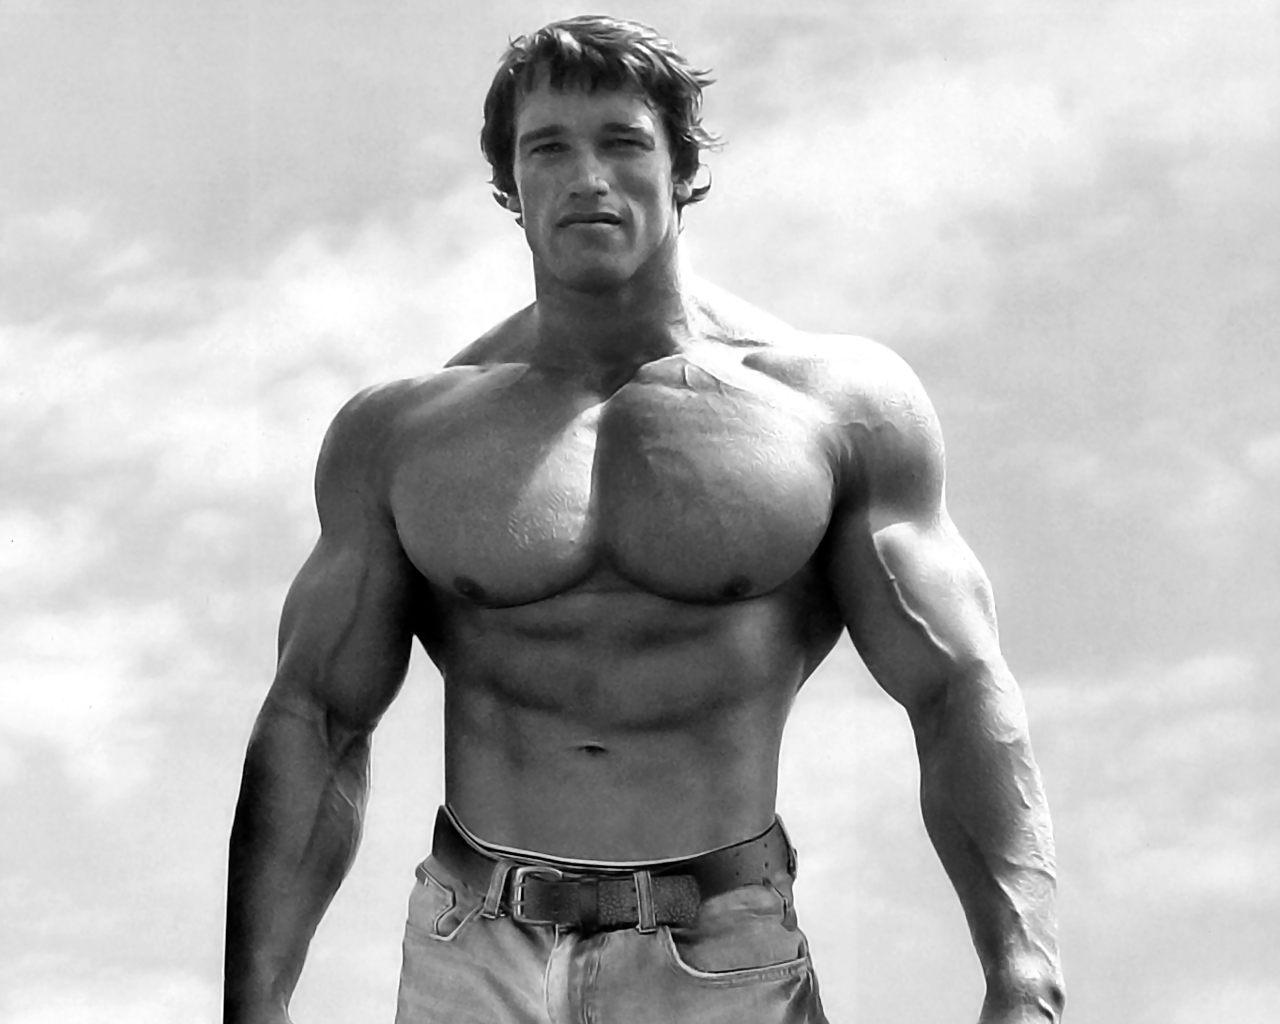 http://2.bp.blogspot.com/-wZFLCkhjdYk/T_x4FJxVVwI/AAAAAAAAAFM/MSvSmh0iay0/s1600/Arnold+Schwarzenegger+Bodybuilding+Wallpaper-26.JPG